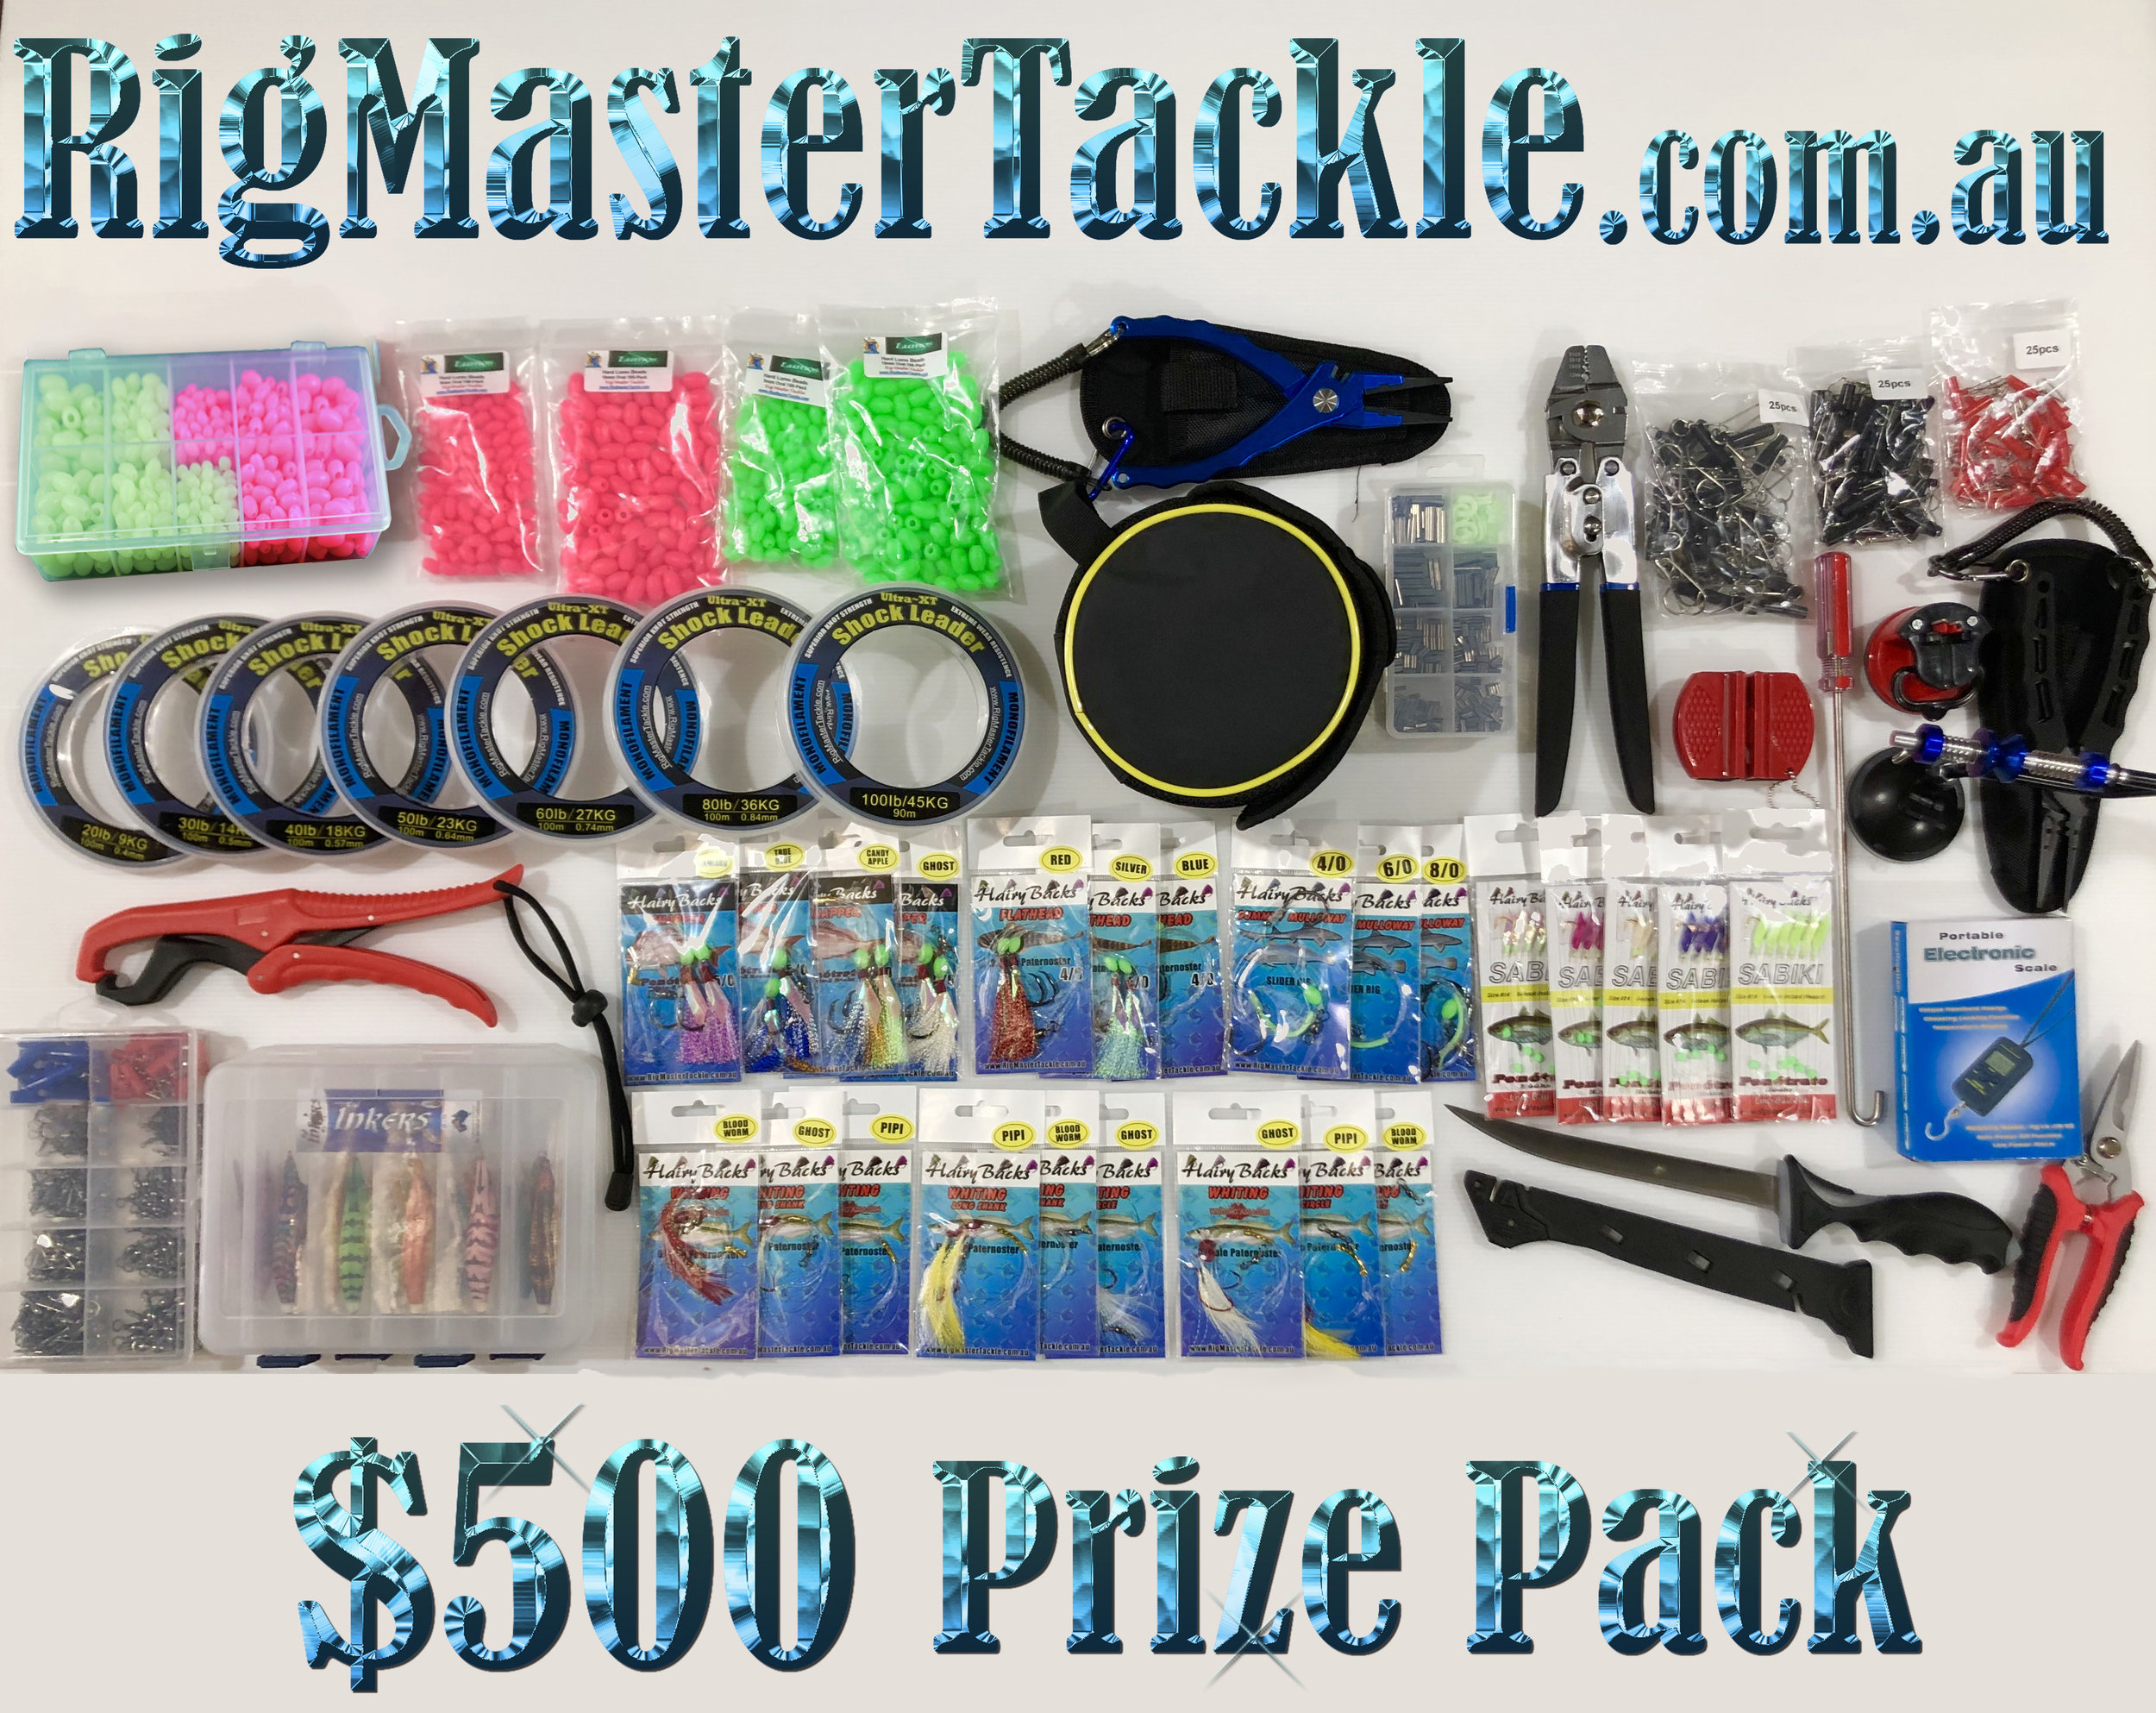 $500 Prize Pack.jpg